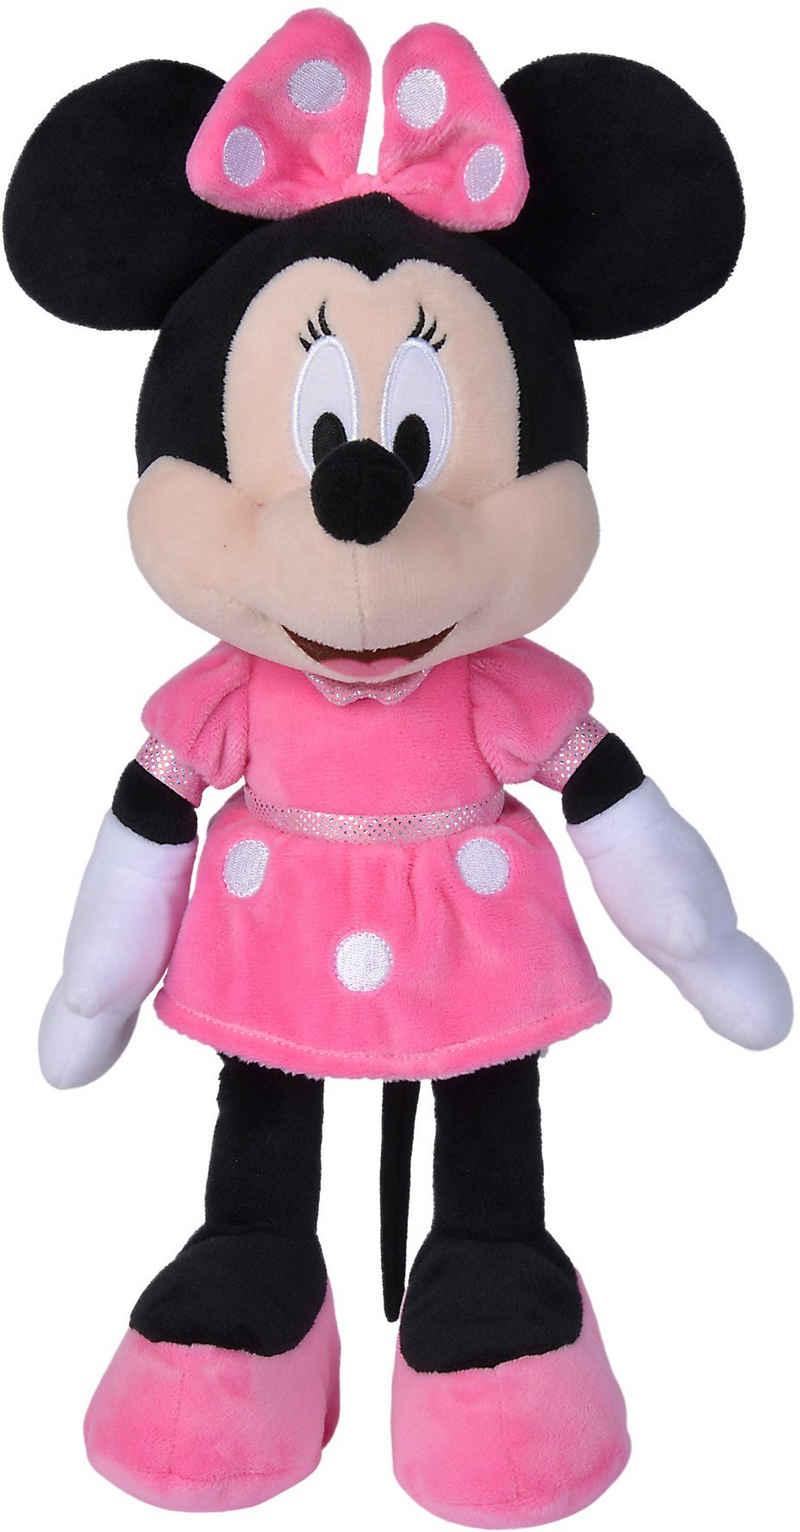 SIMBA Plüschfigur »Disney MM, Minnie, 35 cm«